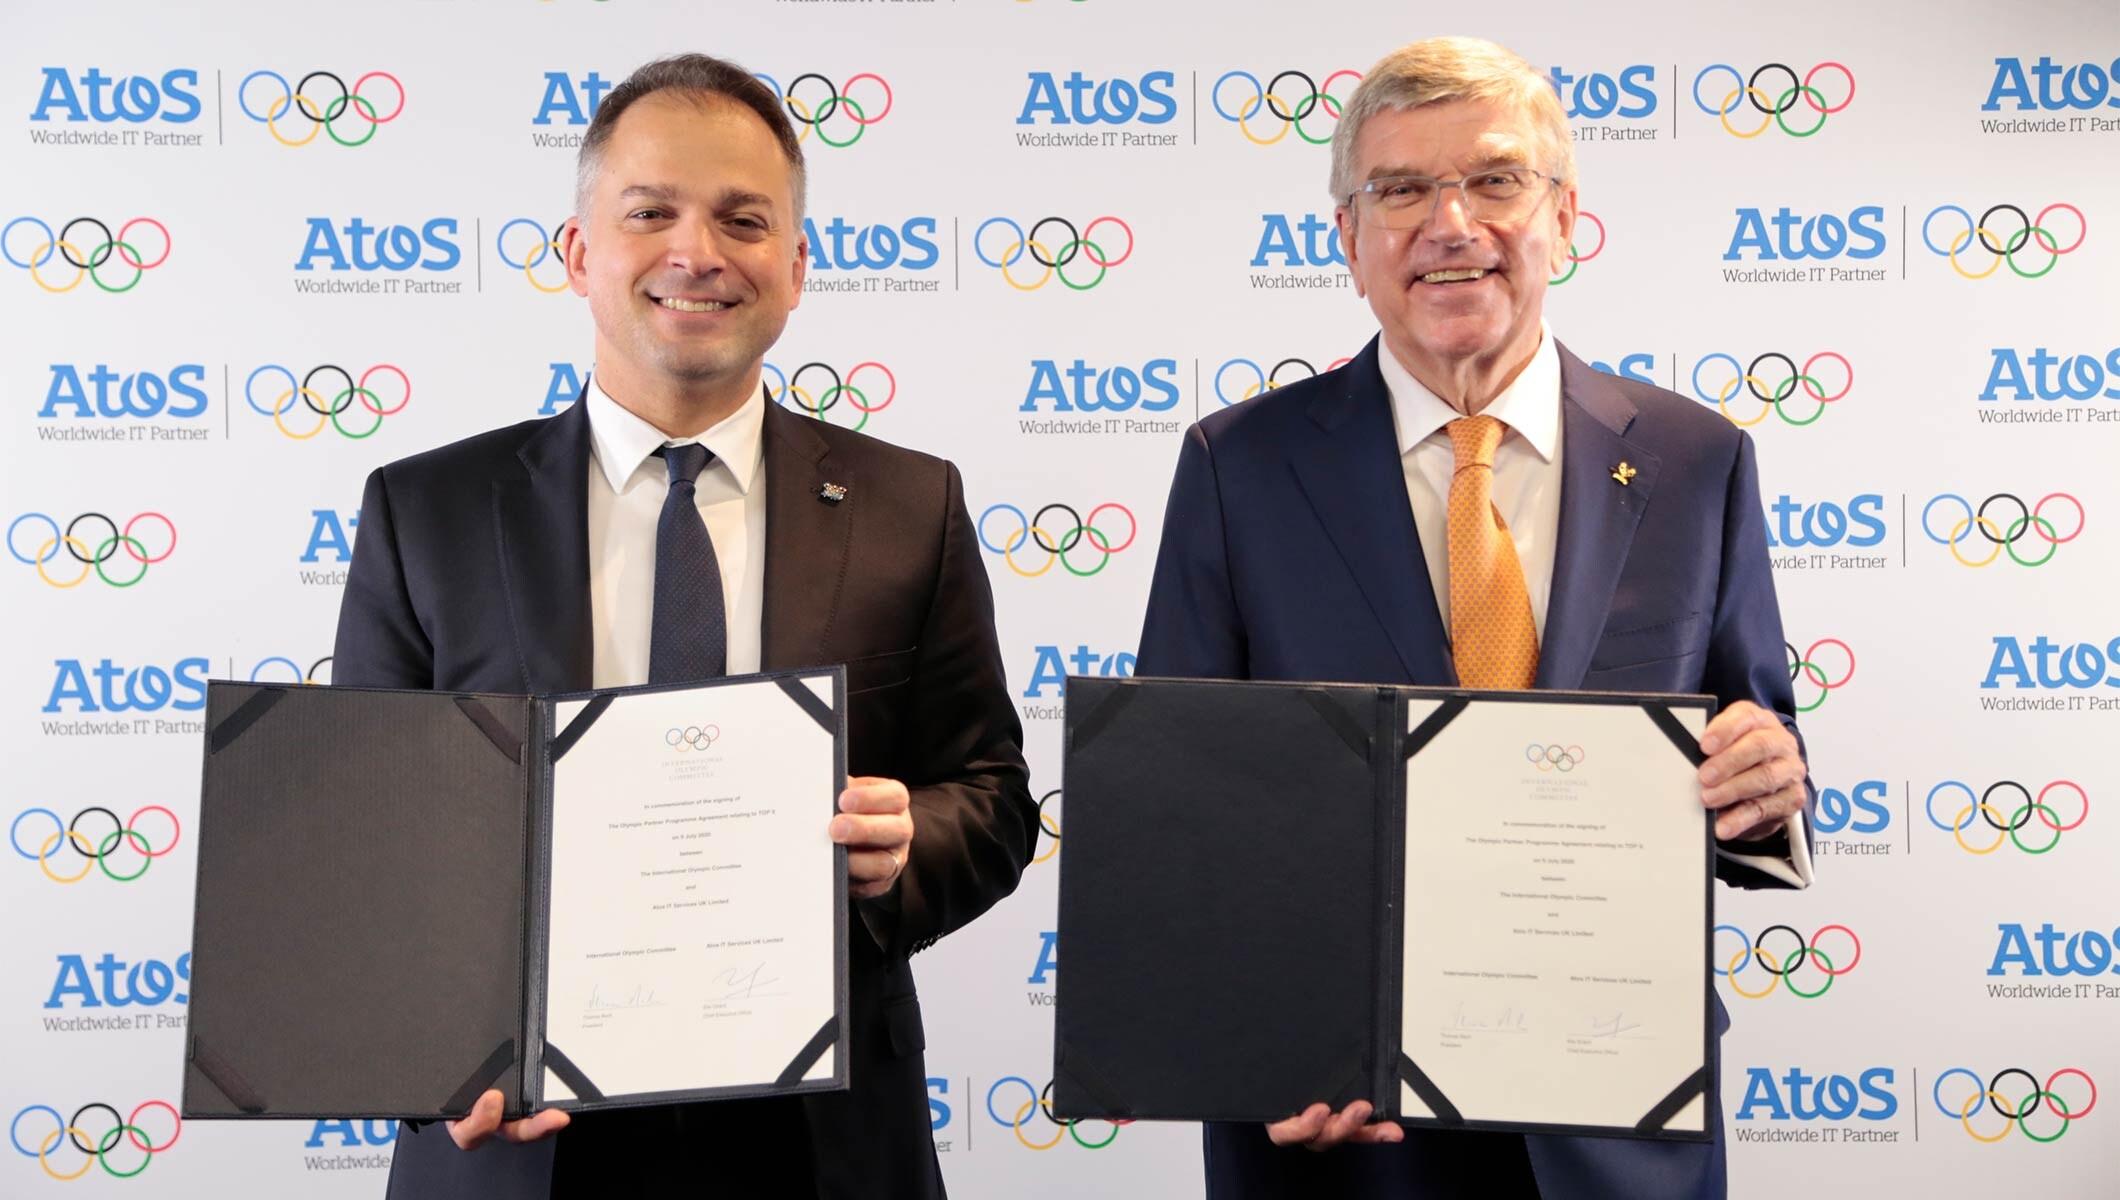 Atos and IOC